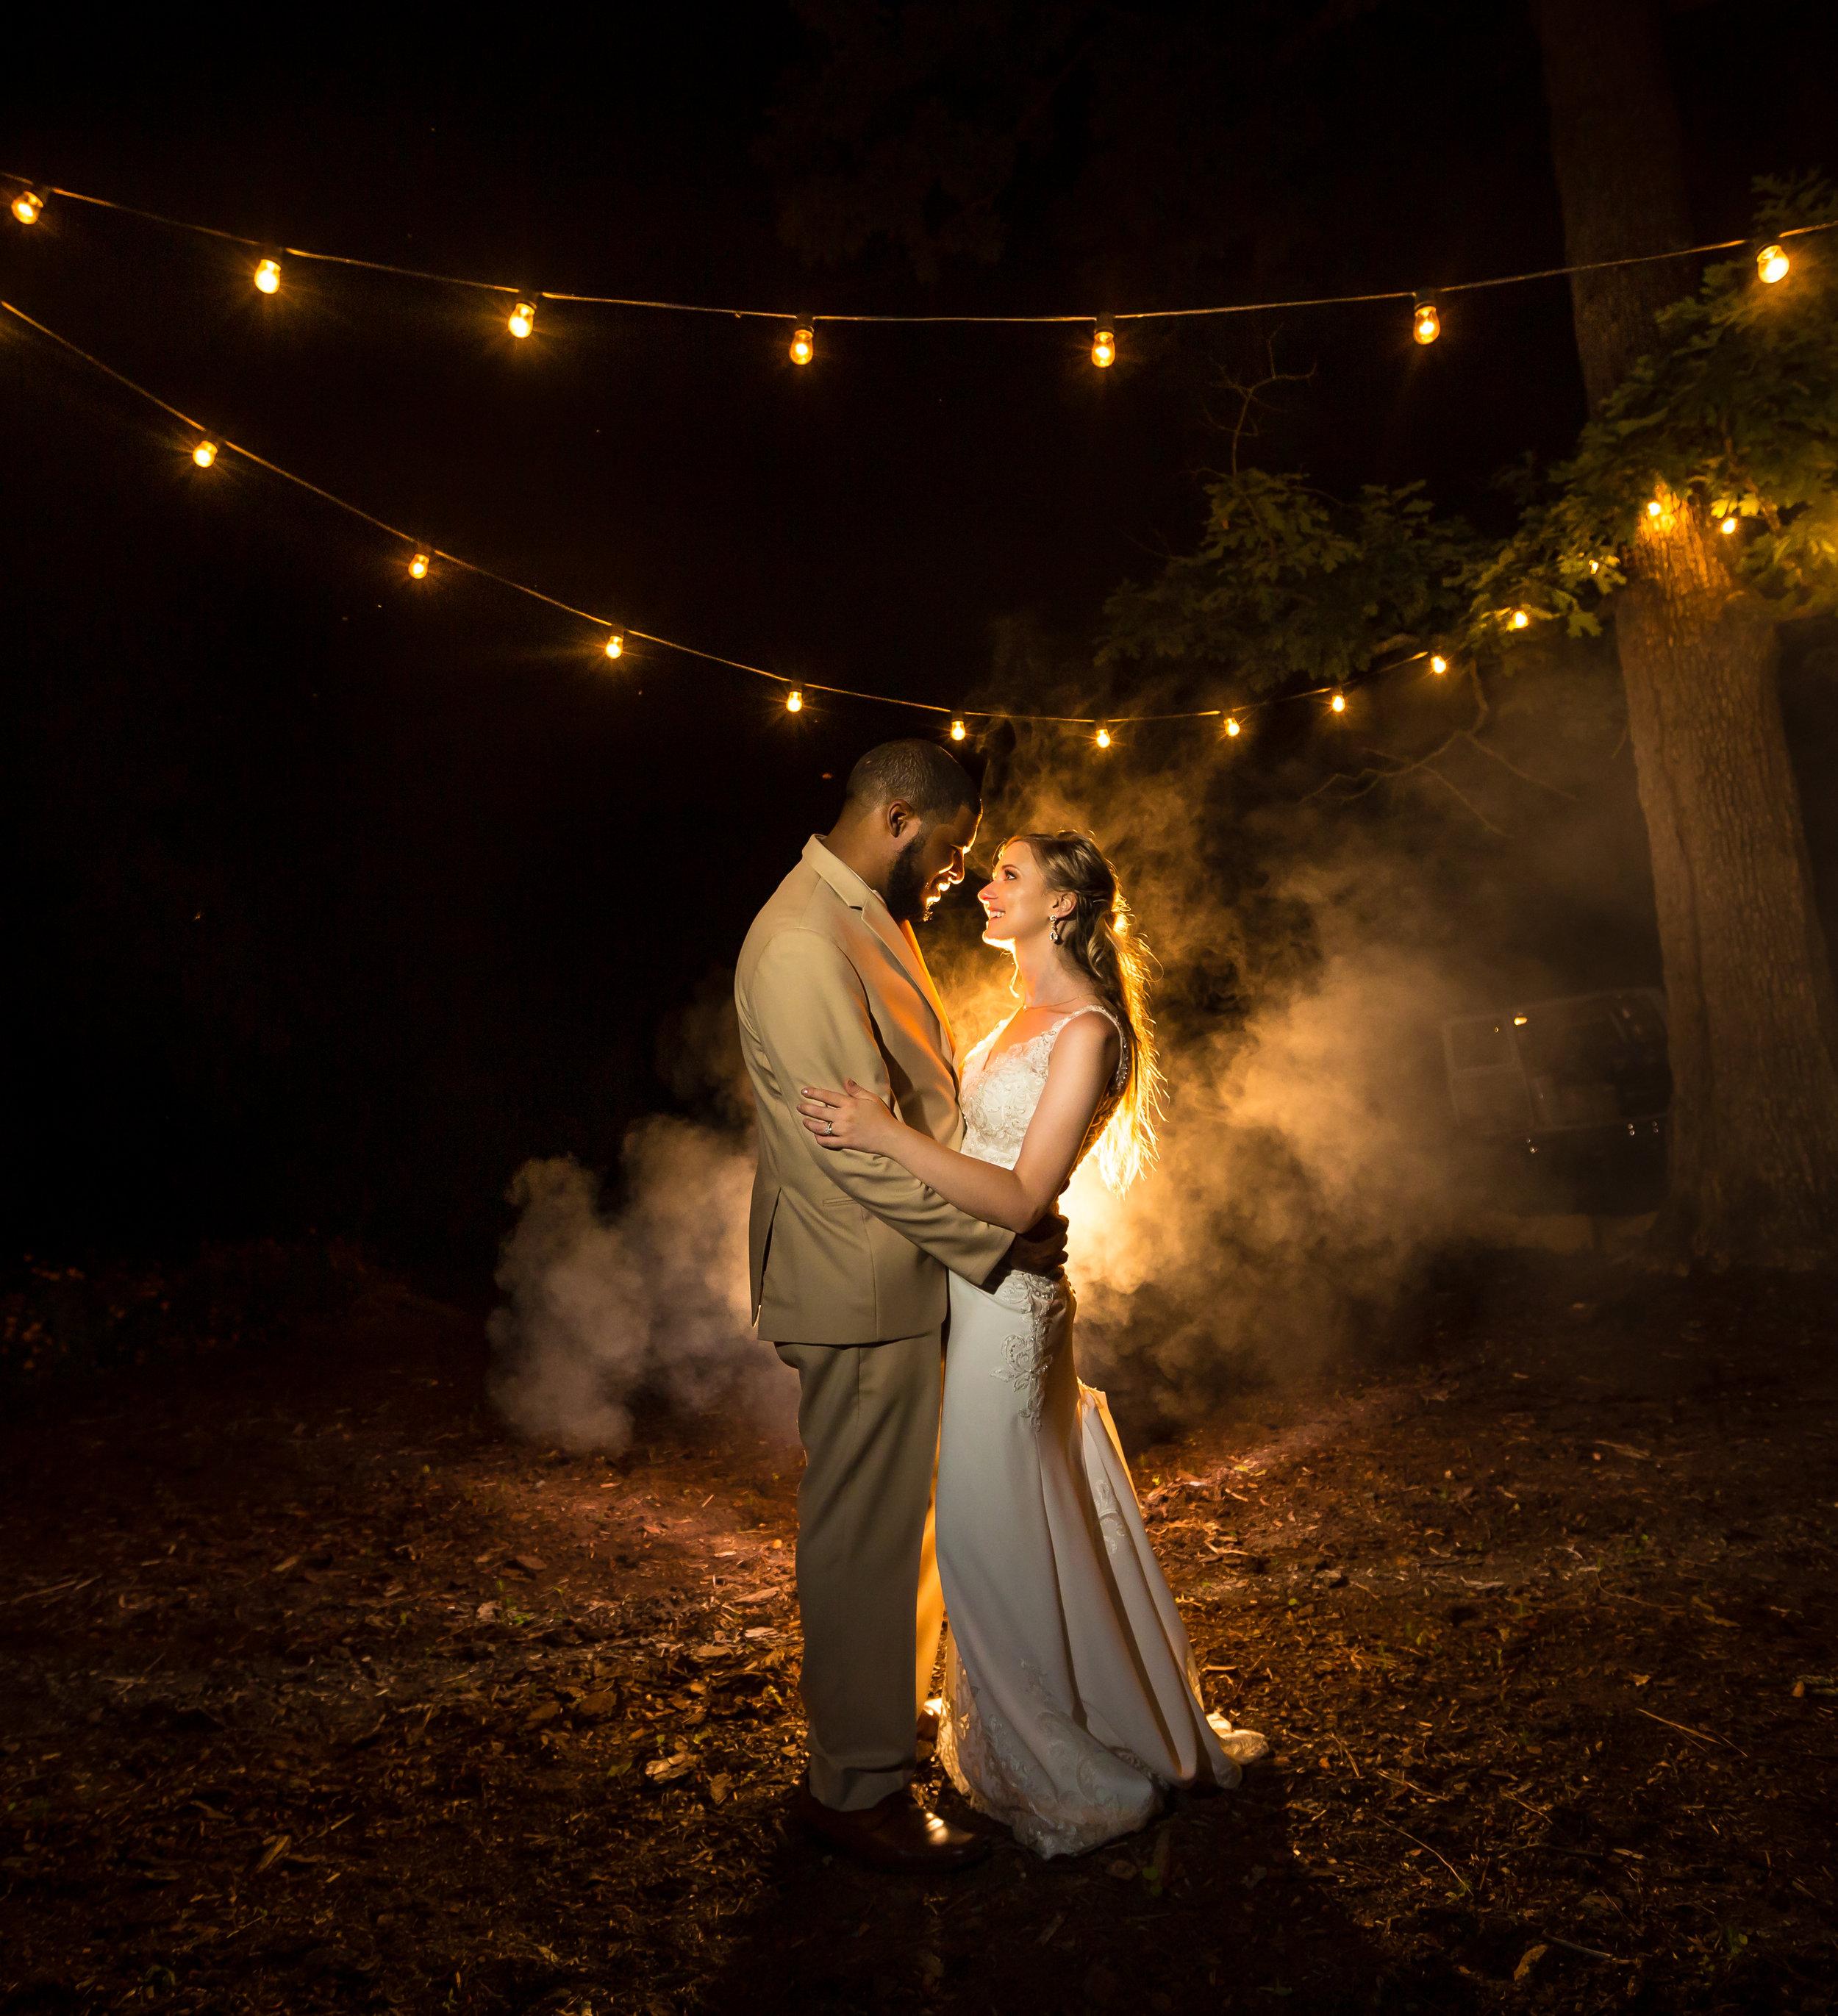 sarah_ikeem_wedding_at_the_parlour_at_manns_chapel_05.18.19-2075.jpg